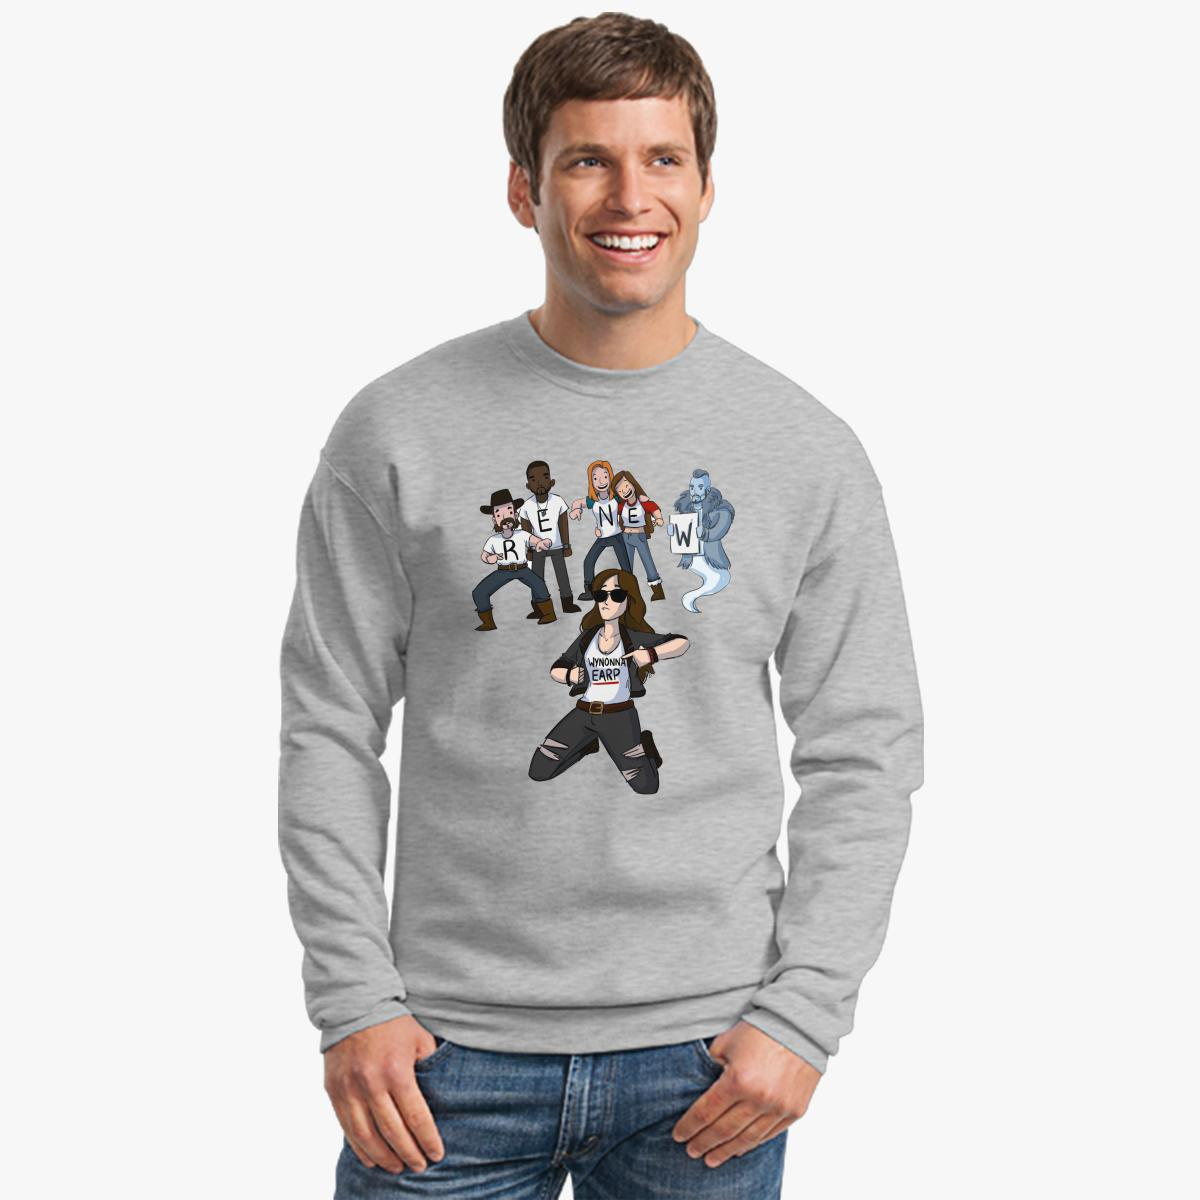 ART Crewneck Sweatshirt 0A7Ct